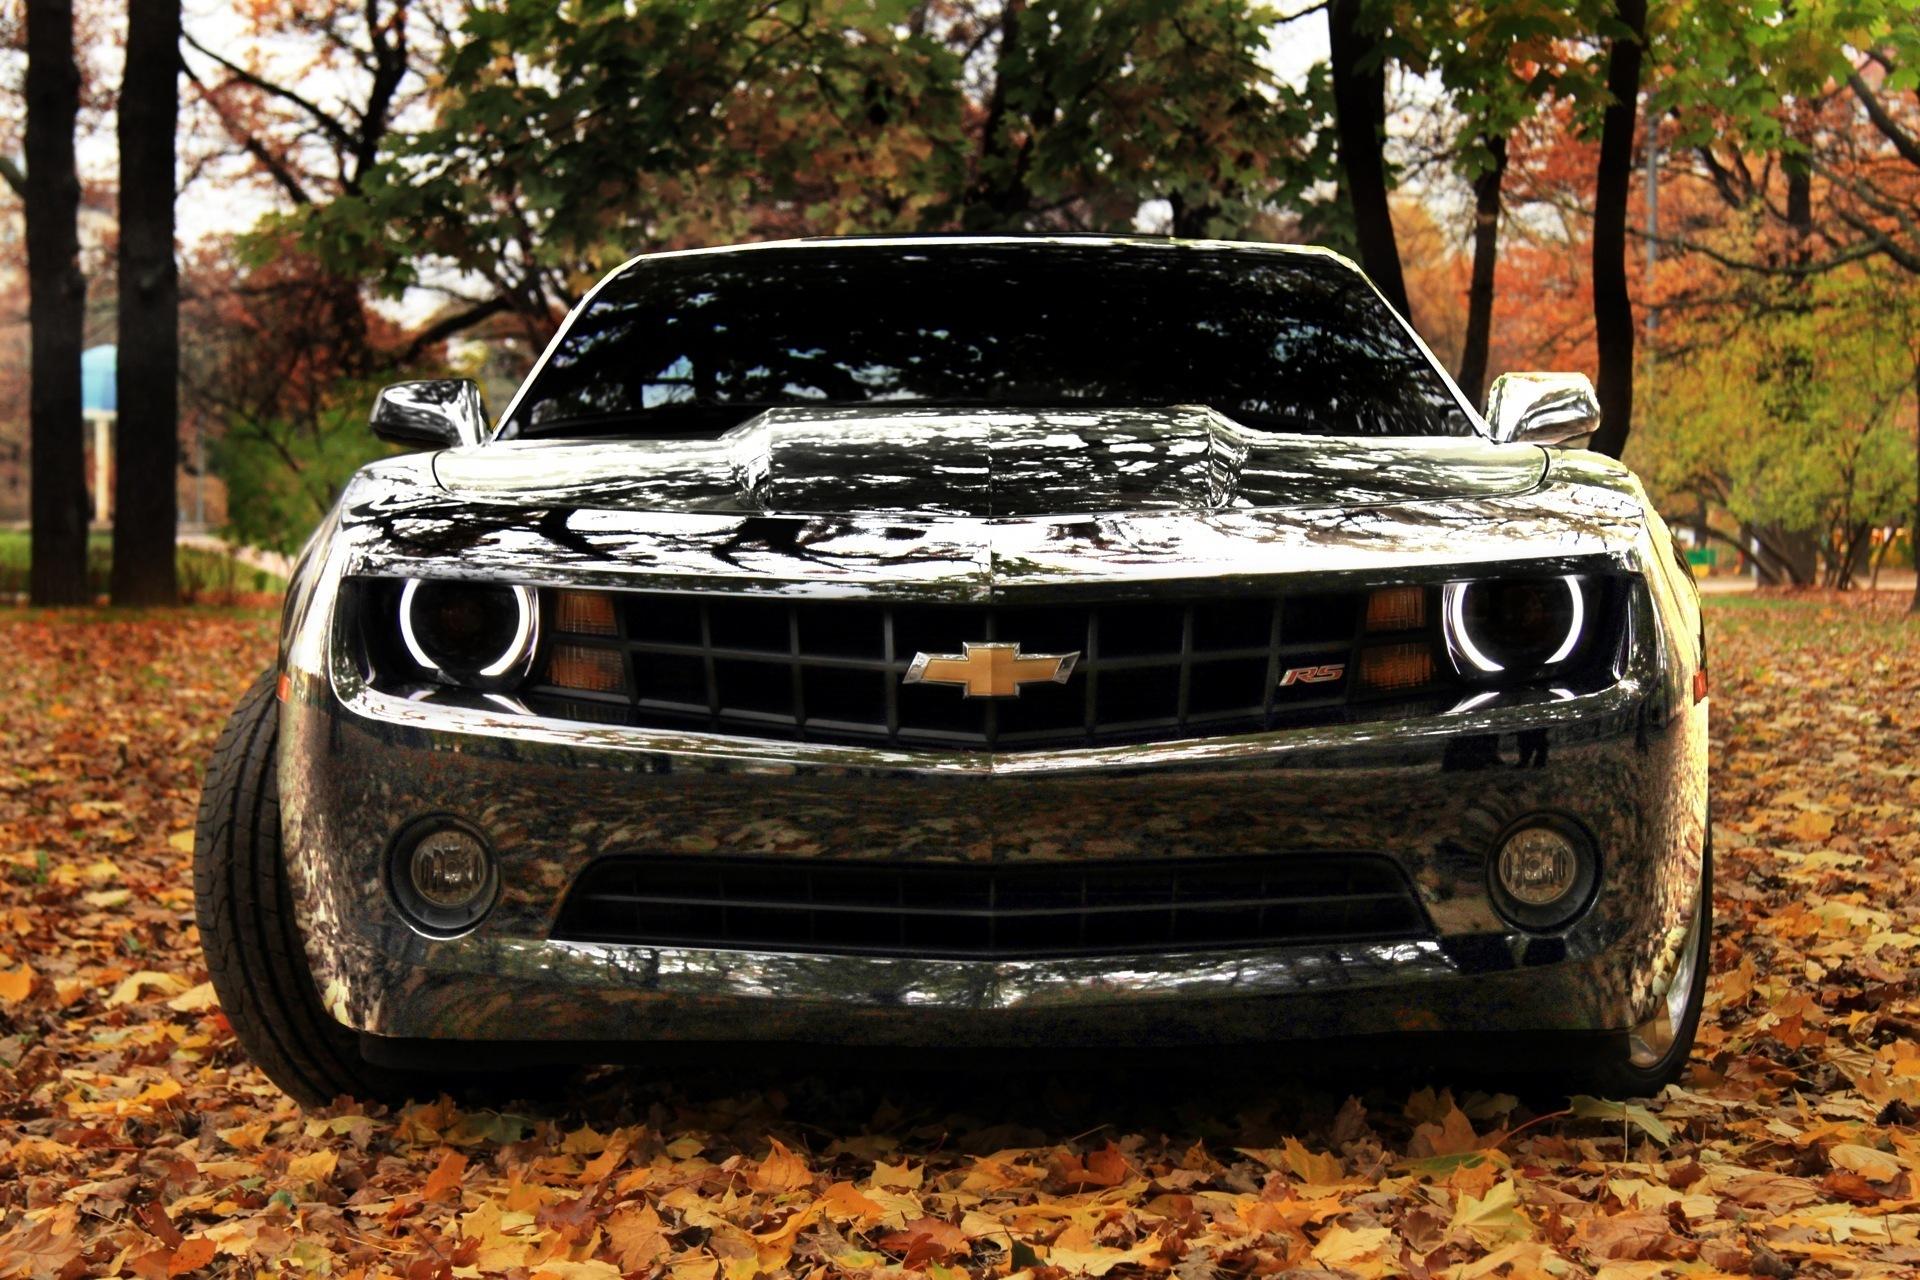 Bumblebee Car Wallpaper Download Free Camaro Hd Backgrounds Pixelstalk Net